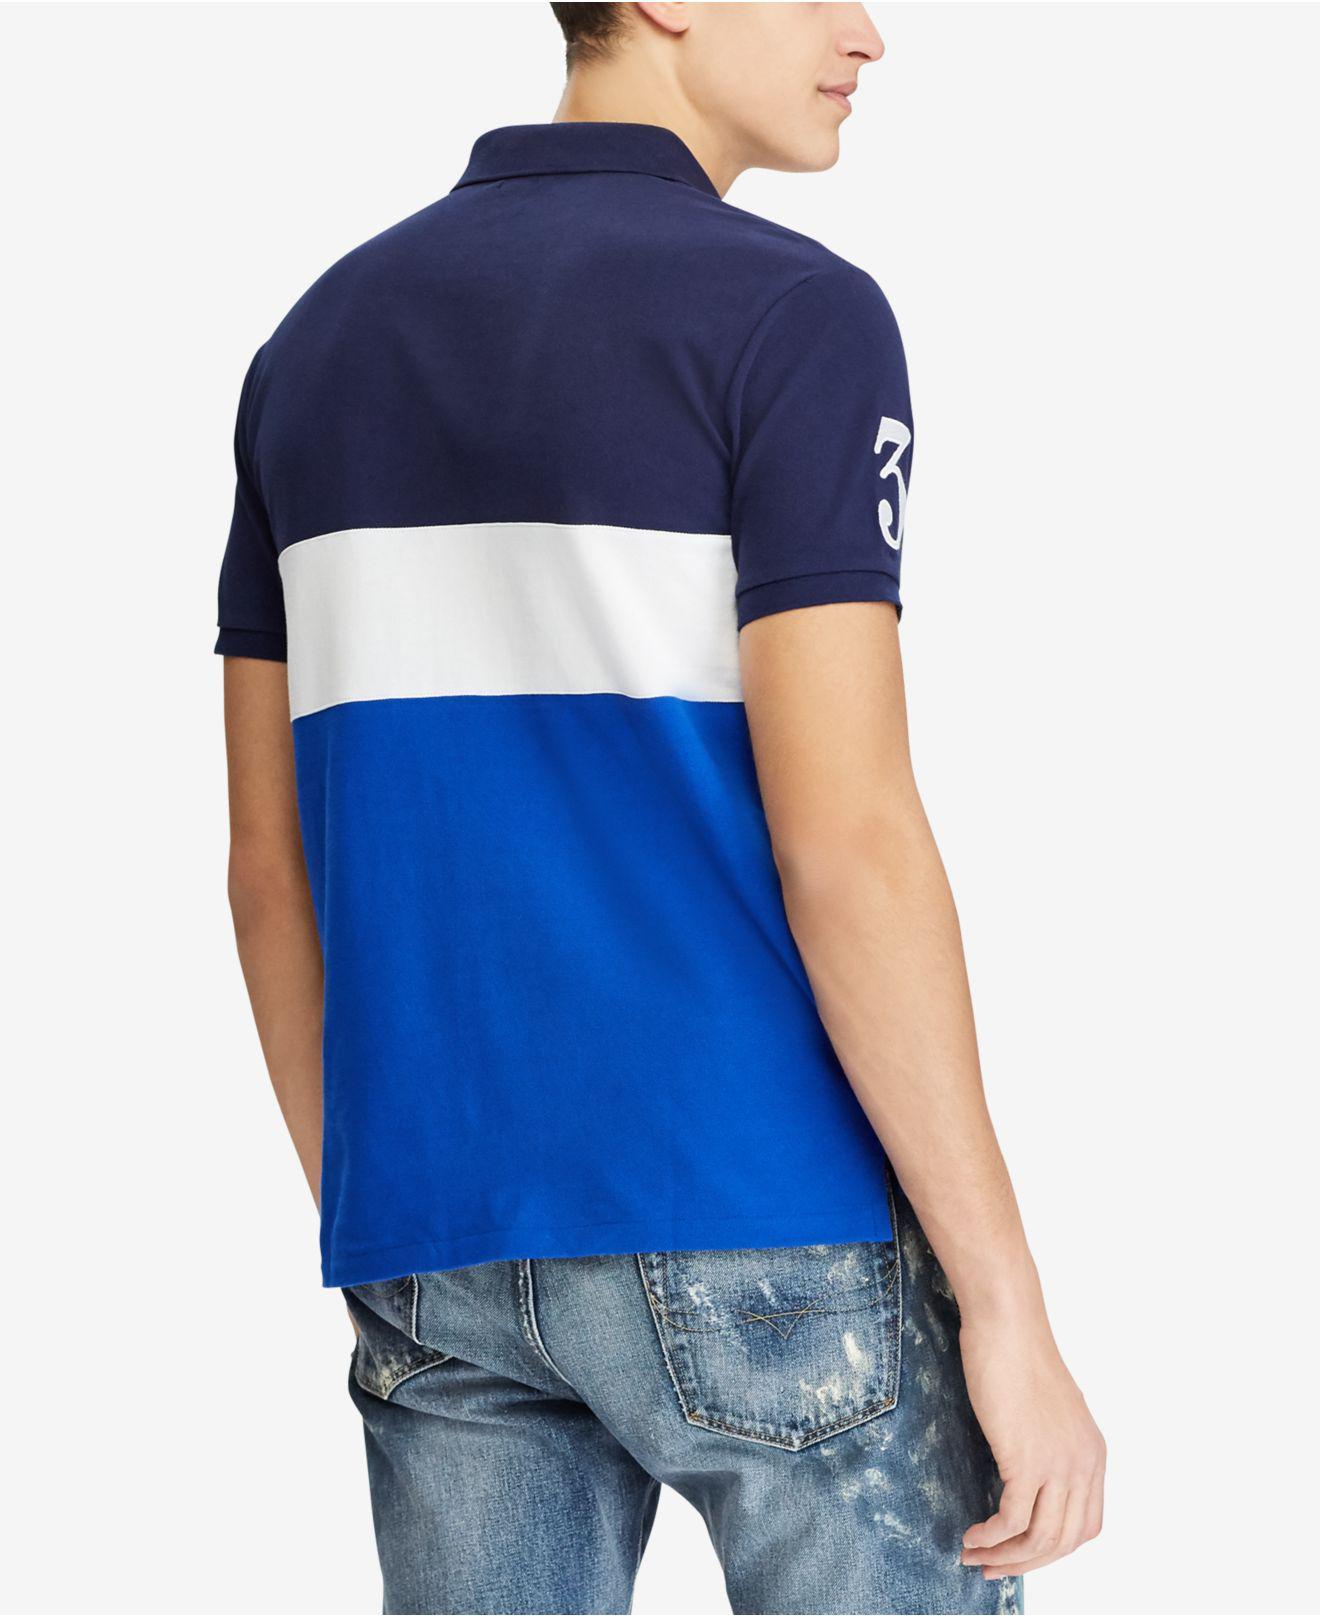 8e9896f1 Dickies Polo Shirts Juniors - DREAMWORKS